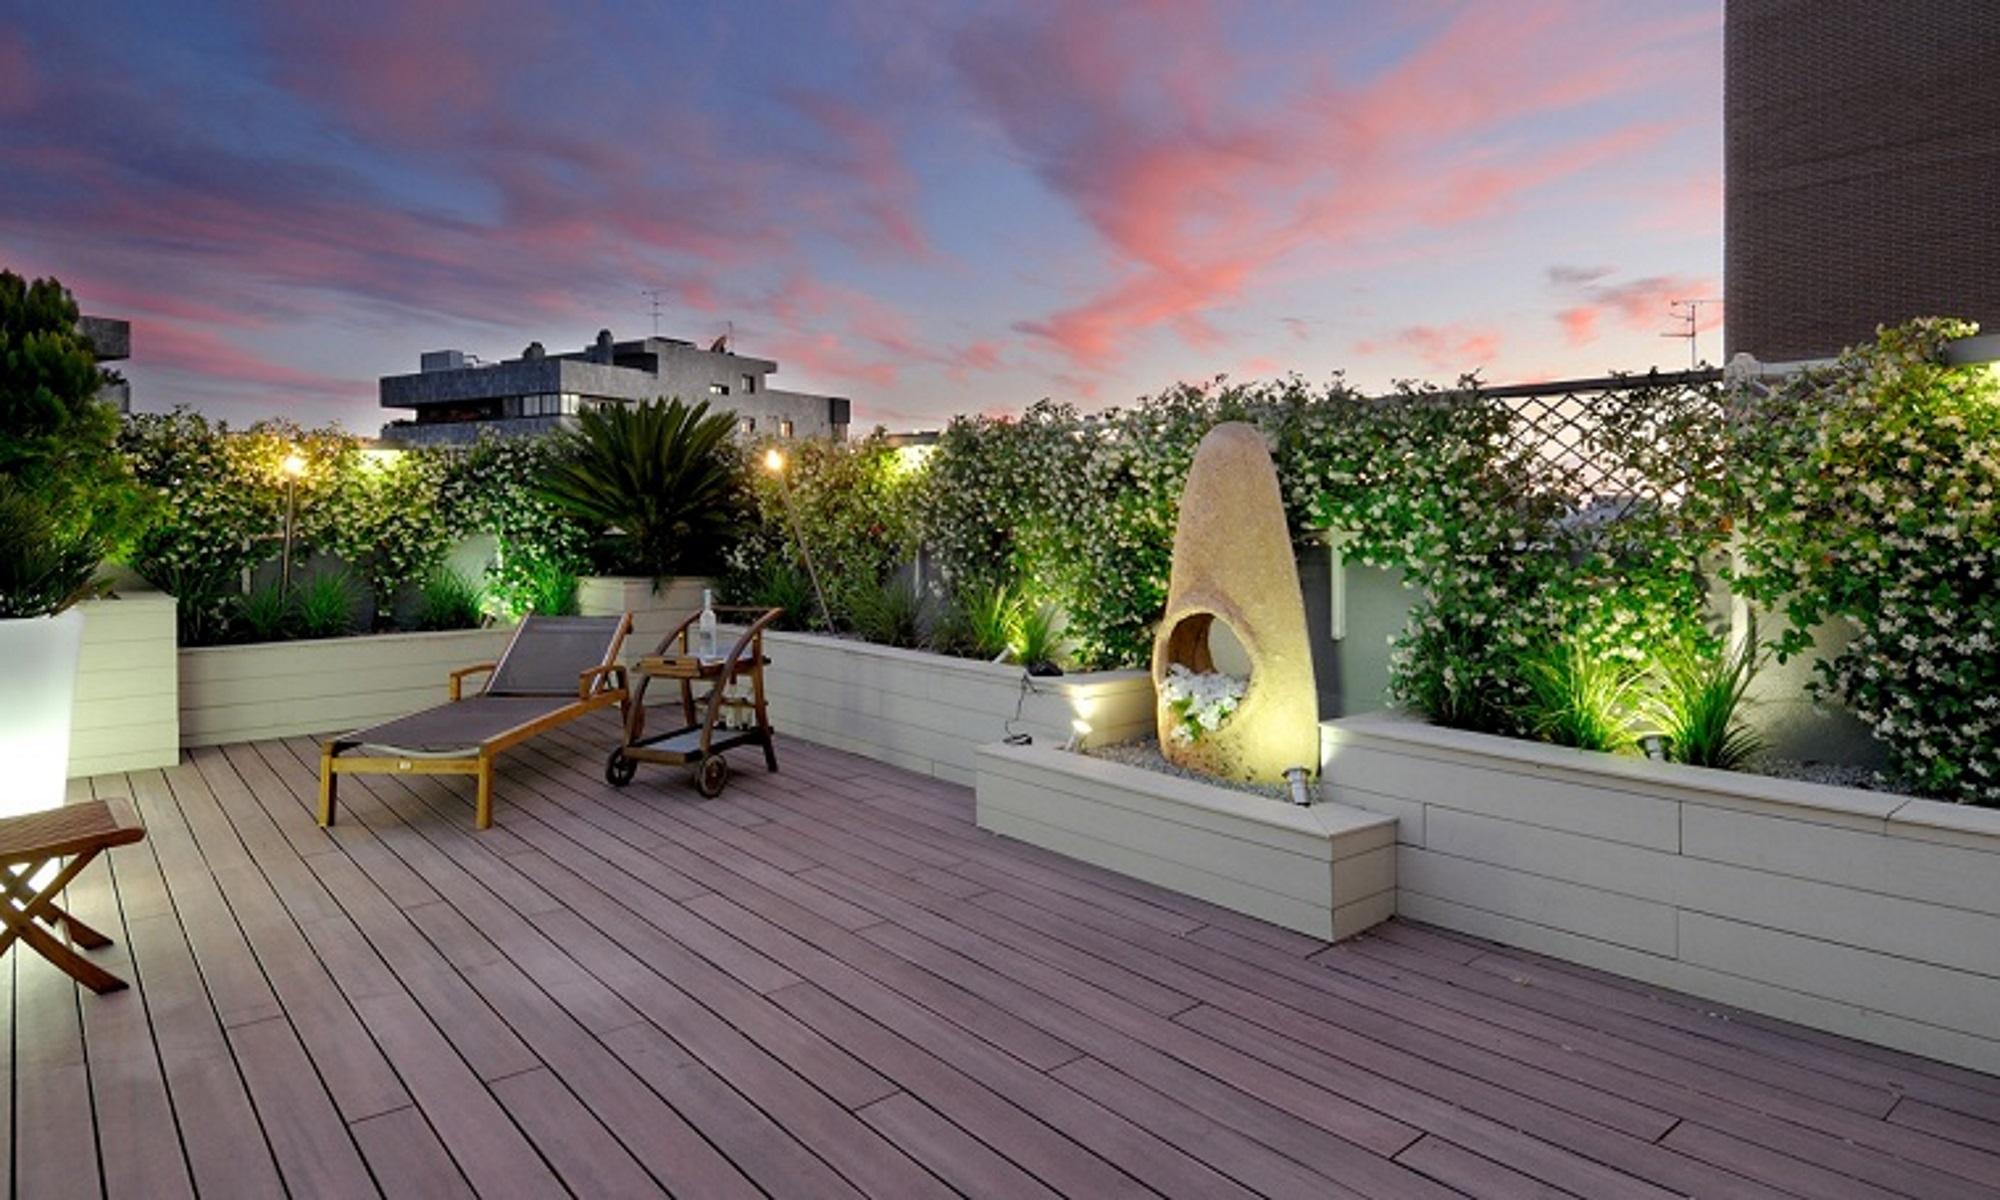 Stunning Terrazza Arredata Ideas - Idee Arredamento Casa & Interior ...